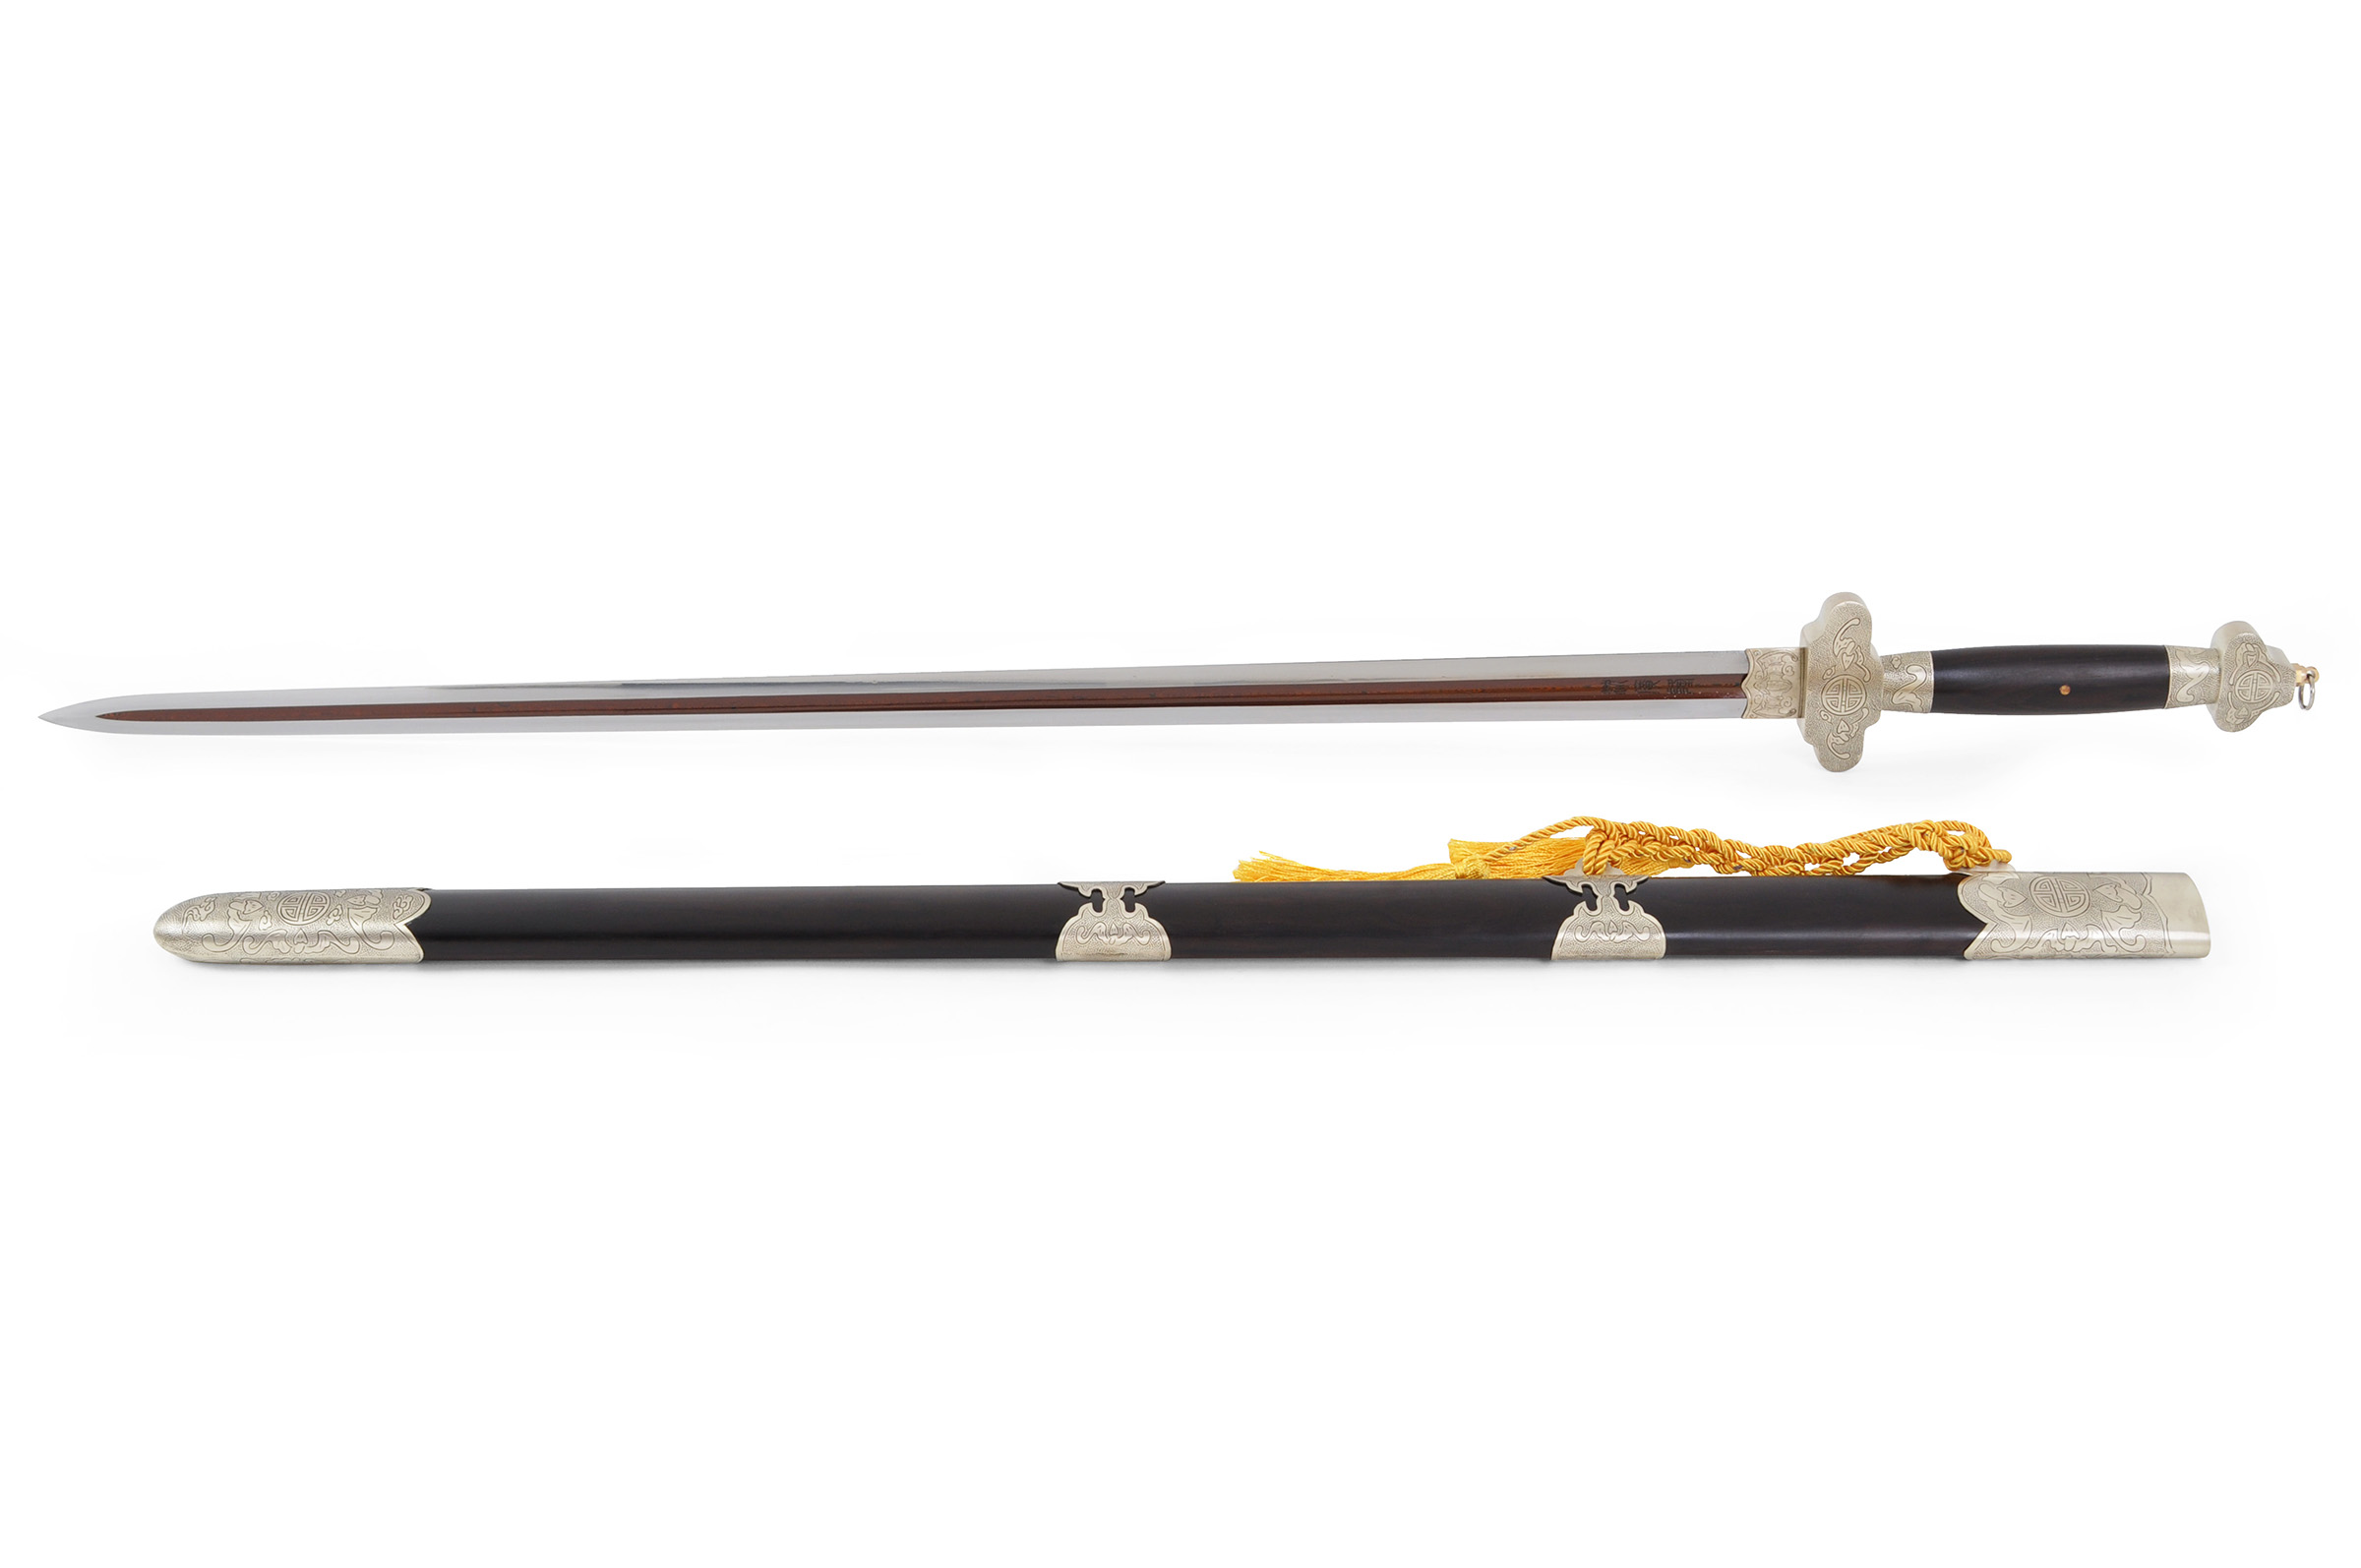 Épée Tai'e (Acier Damas)